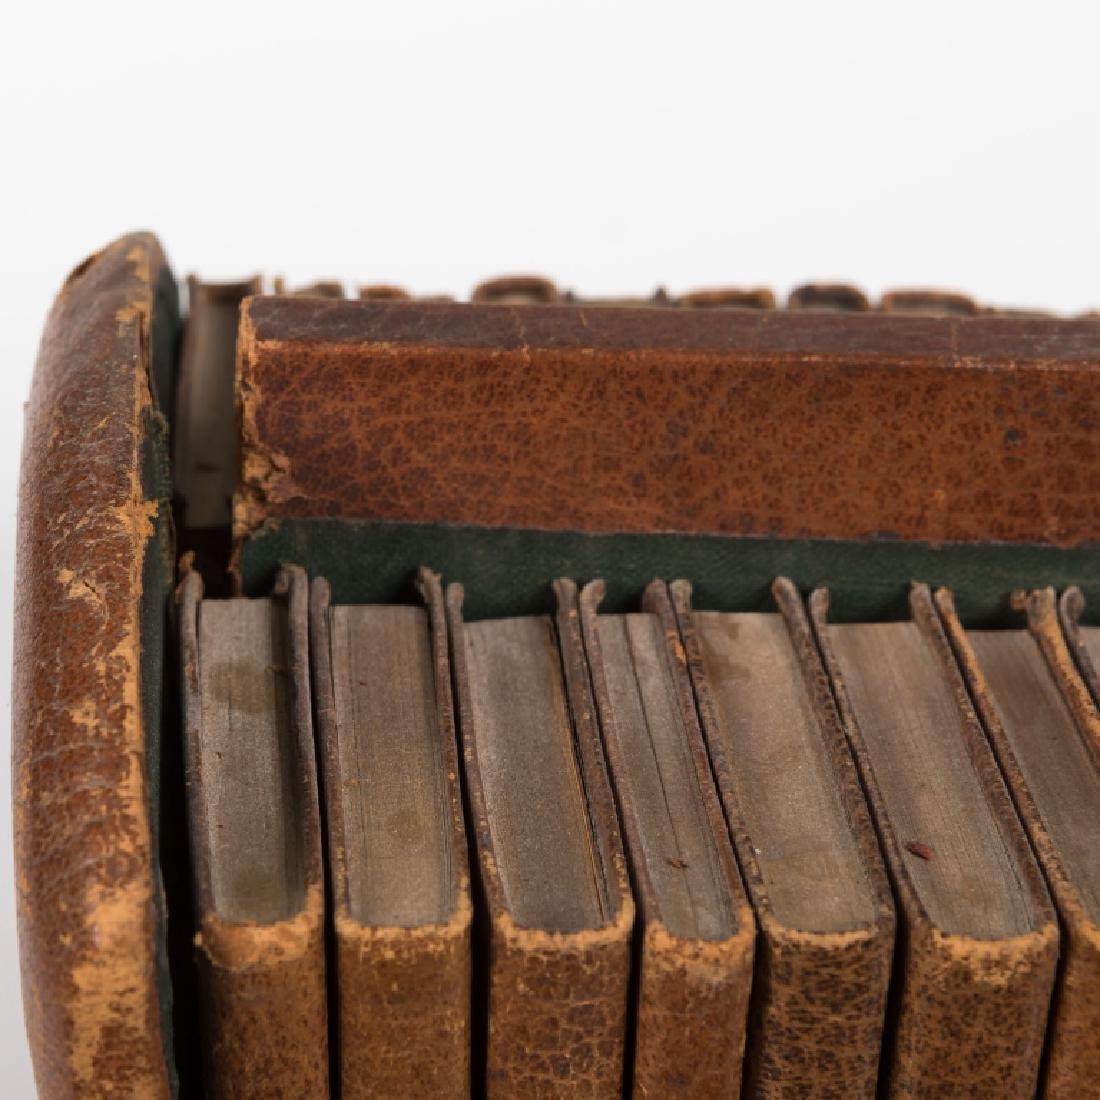 Shakespeare Miniature Set Leather Books - 24 Vol - 4